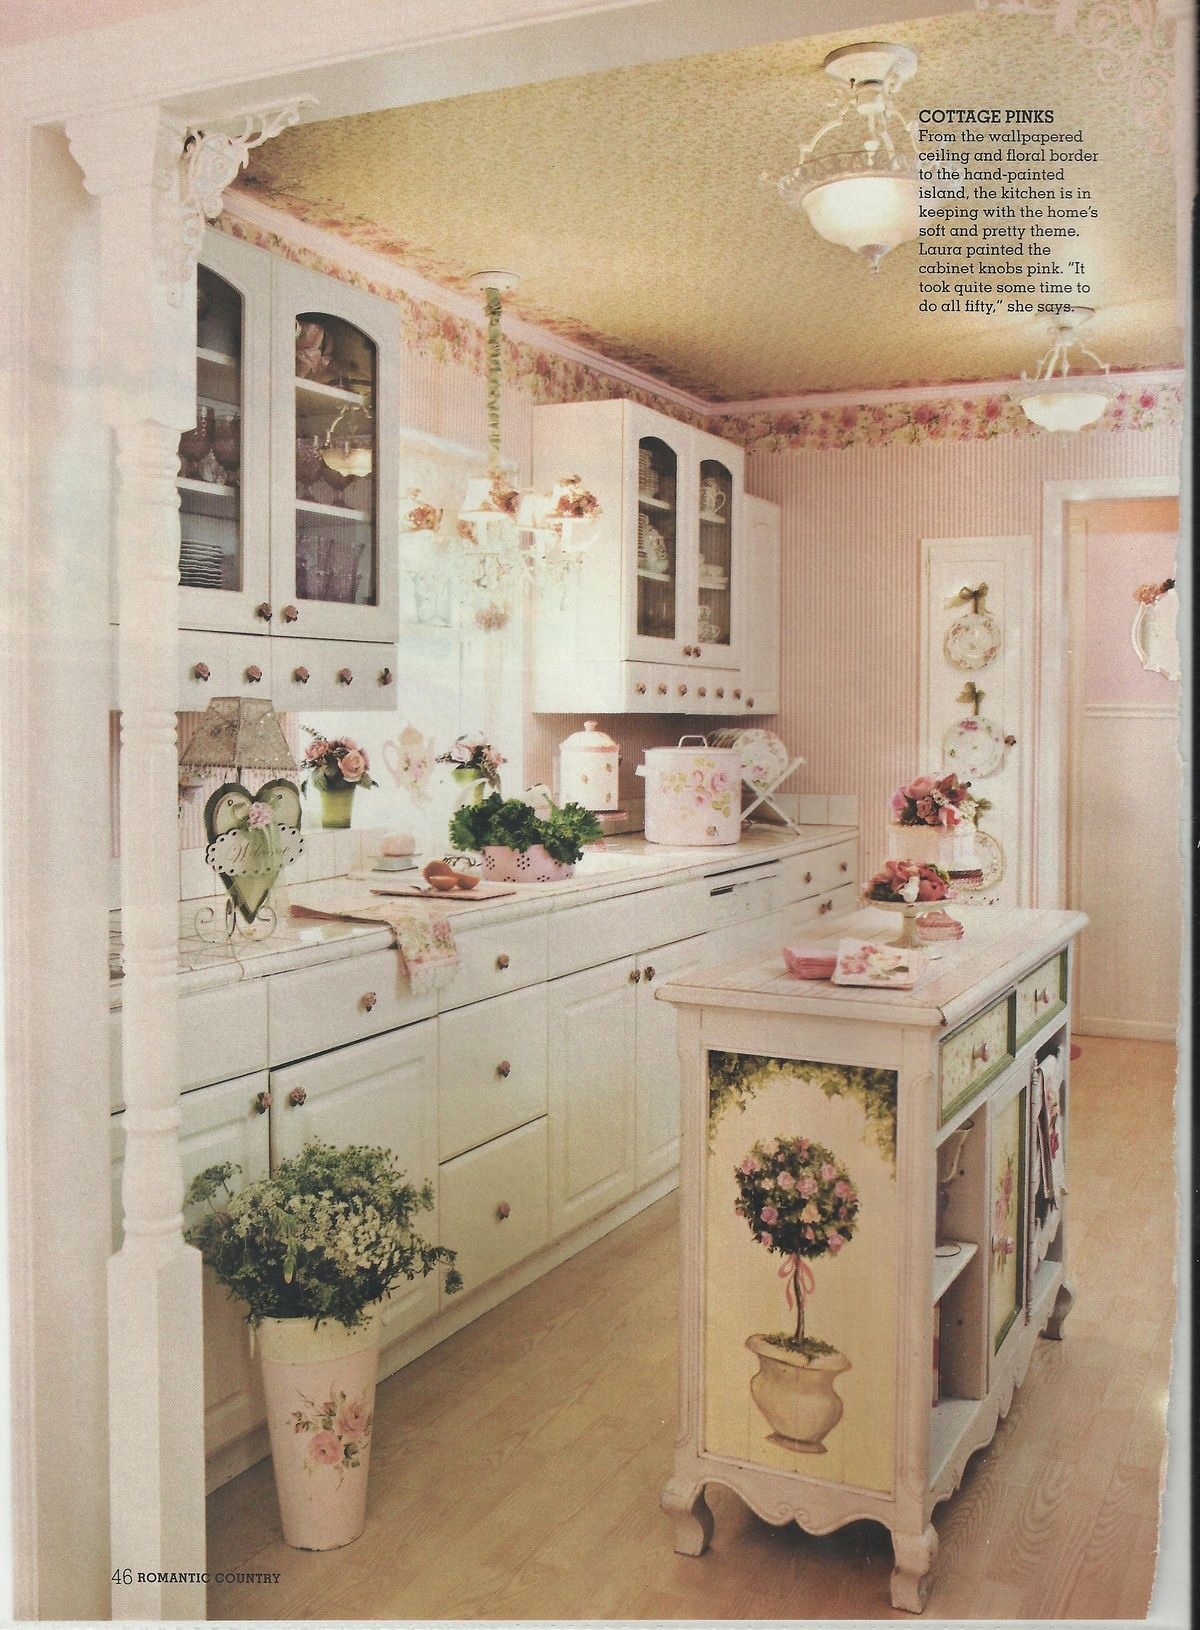 E2dc361919188d6b656333fdcb11db99 Jpg 1 200 1 630 Pixels Kitchen  ~ Cortinas Para Muebles De Cocina